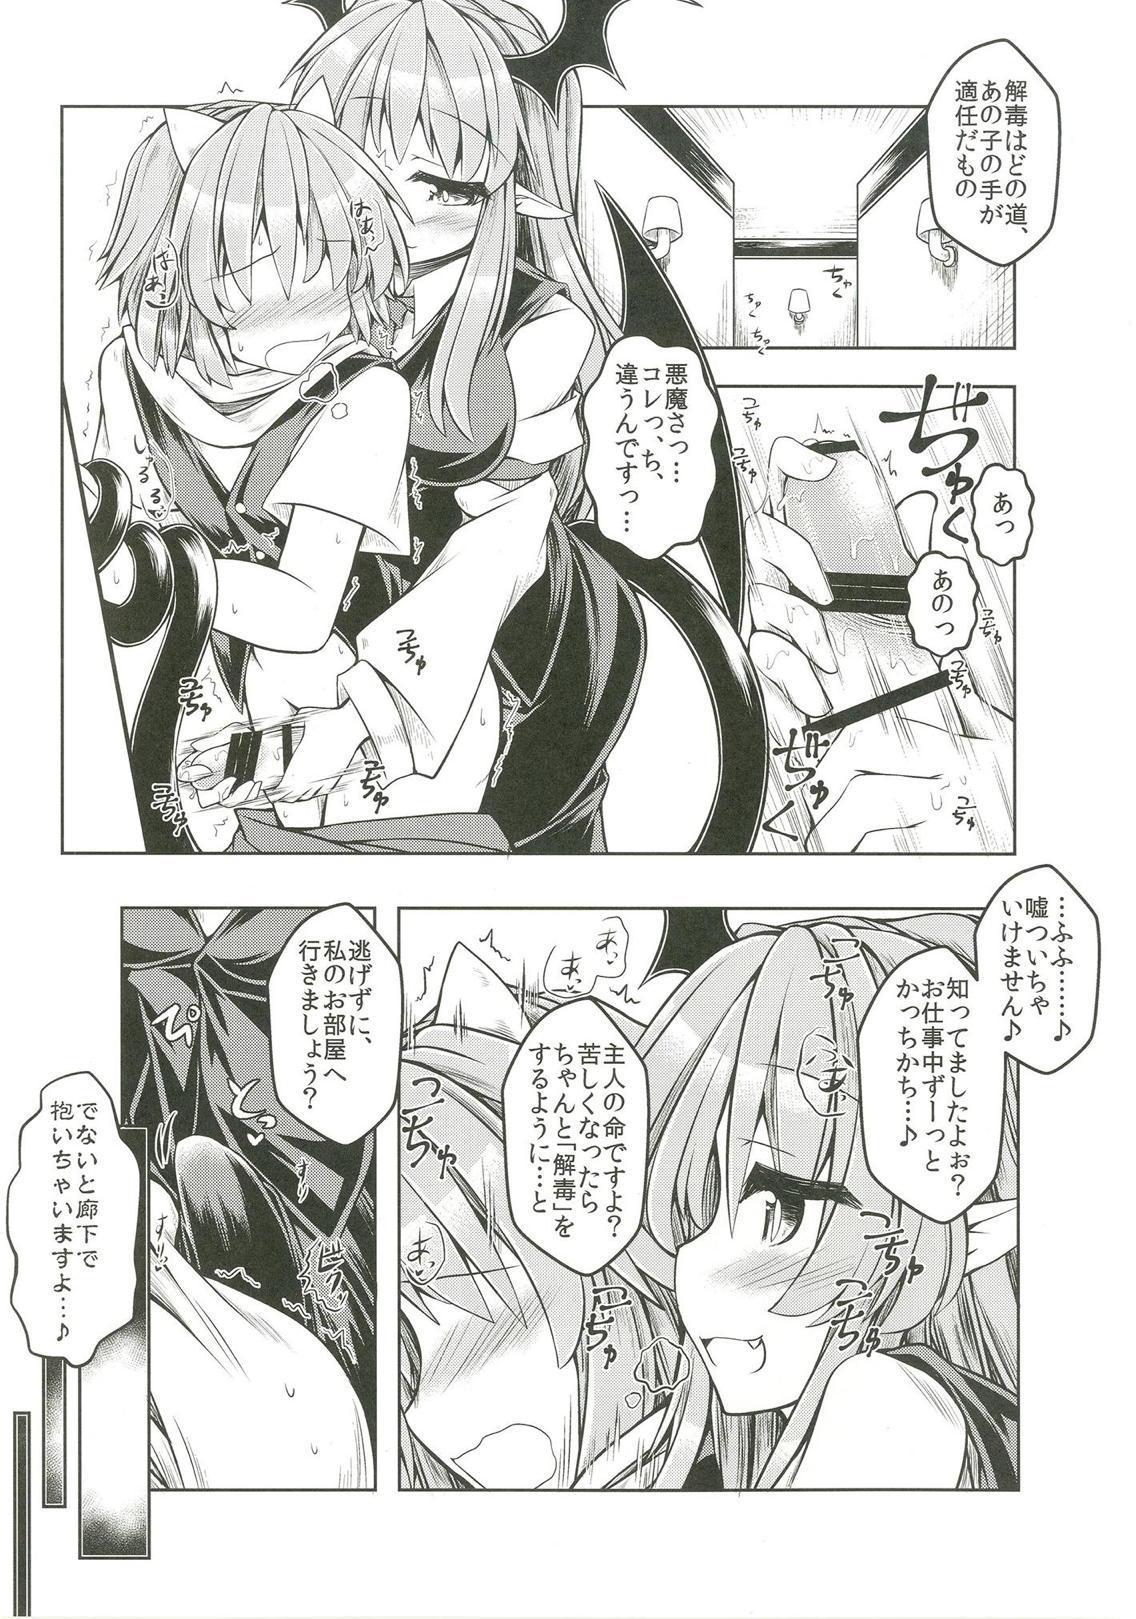 Kari no Ojikan Go.5 3